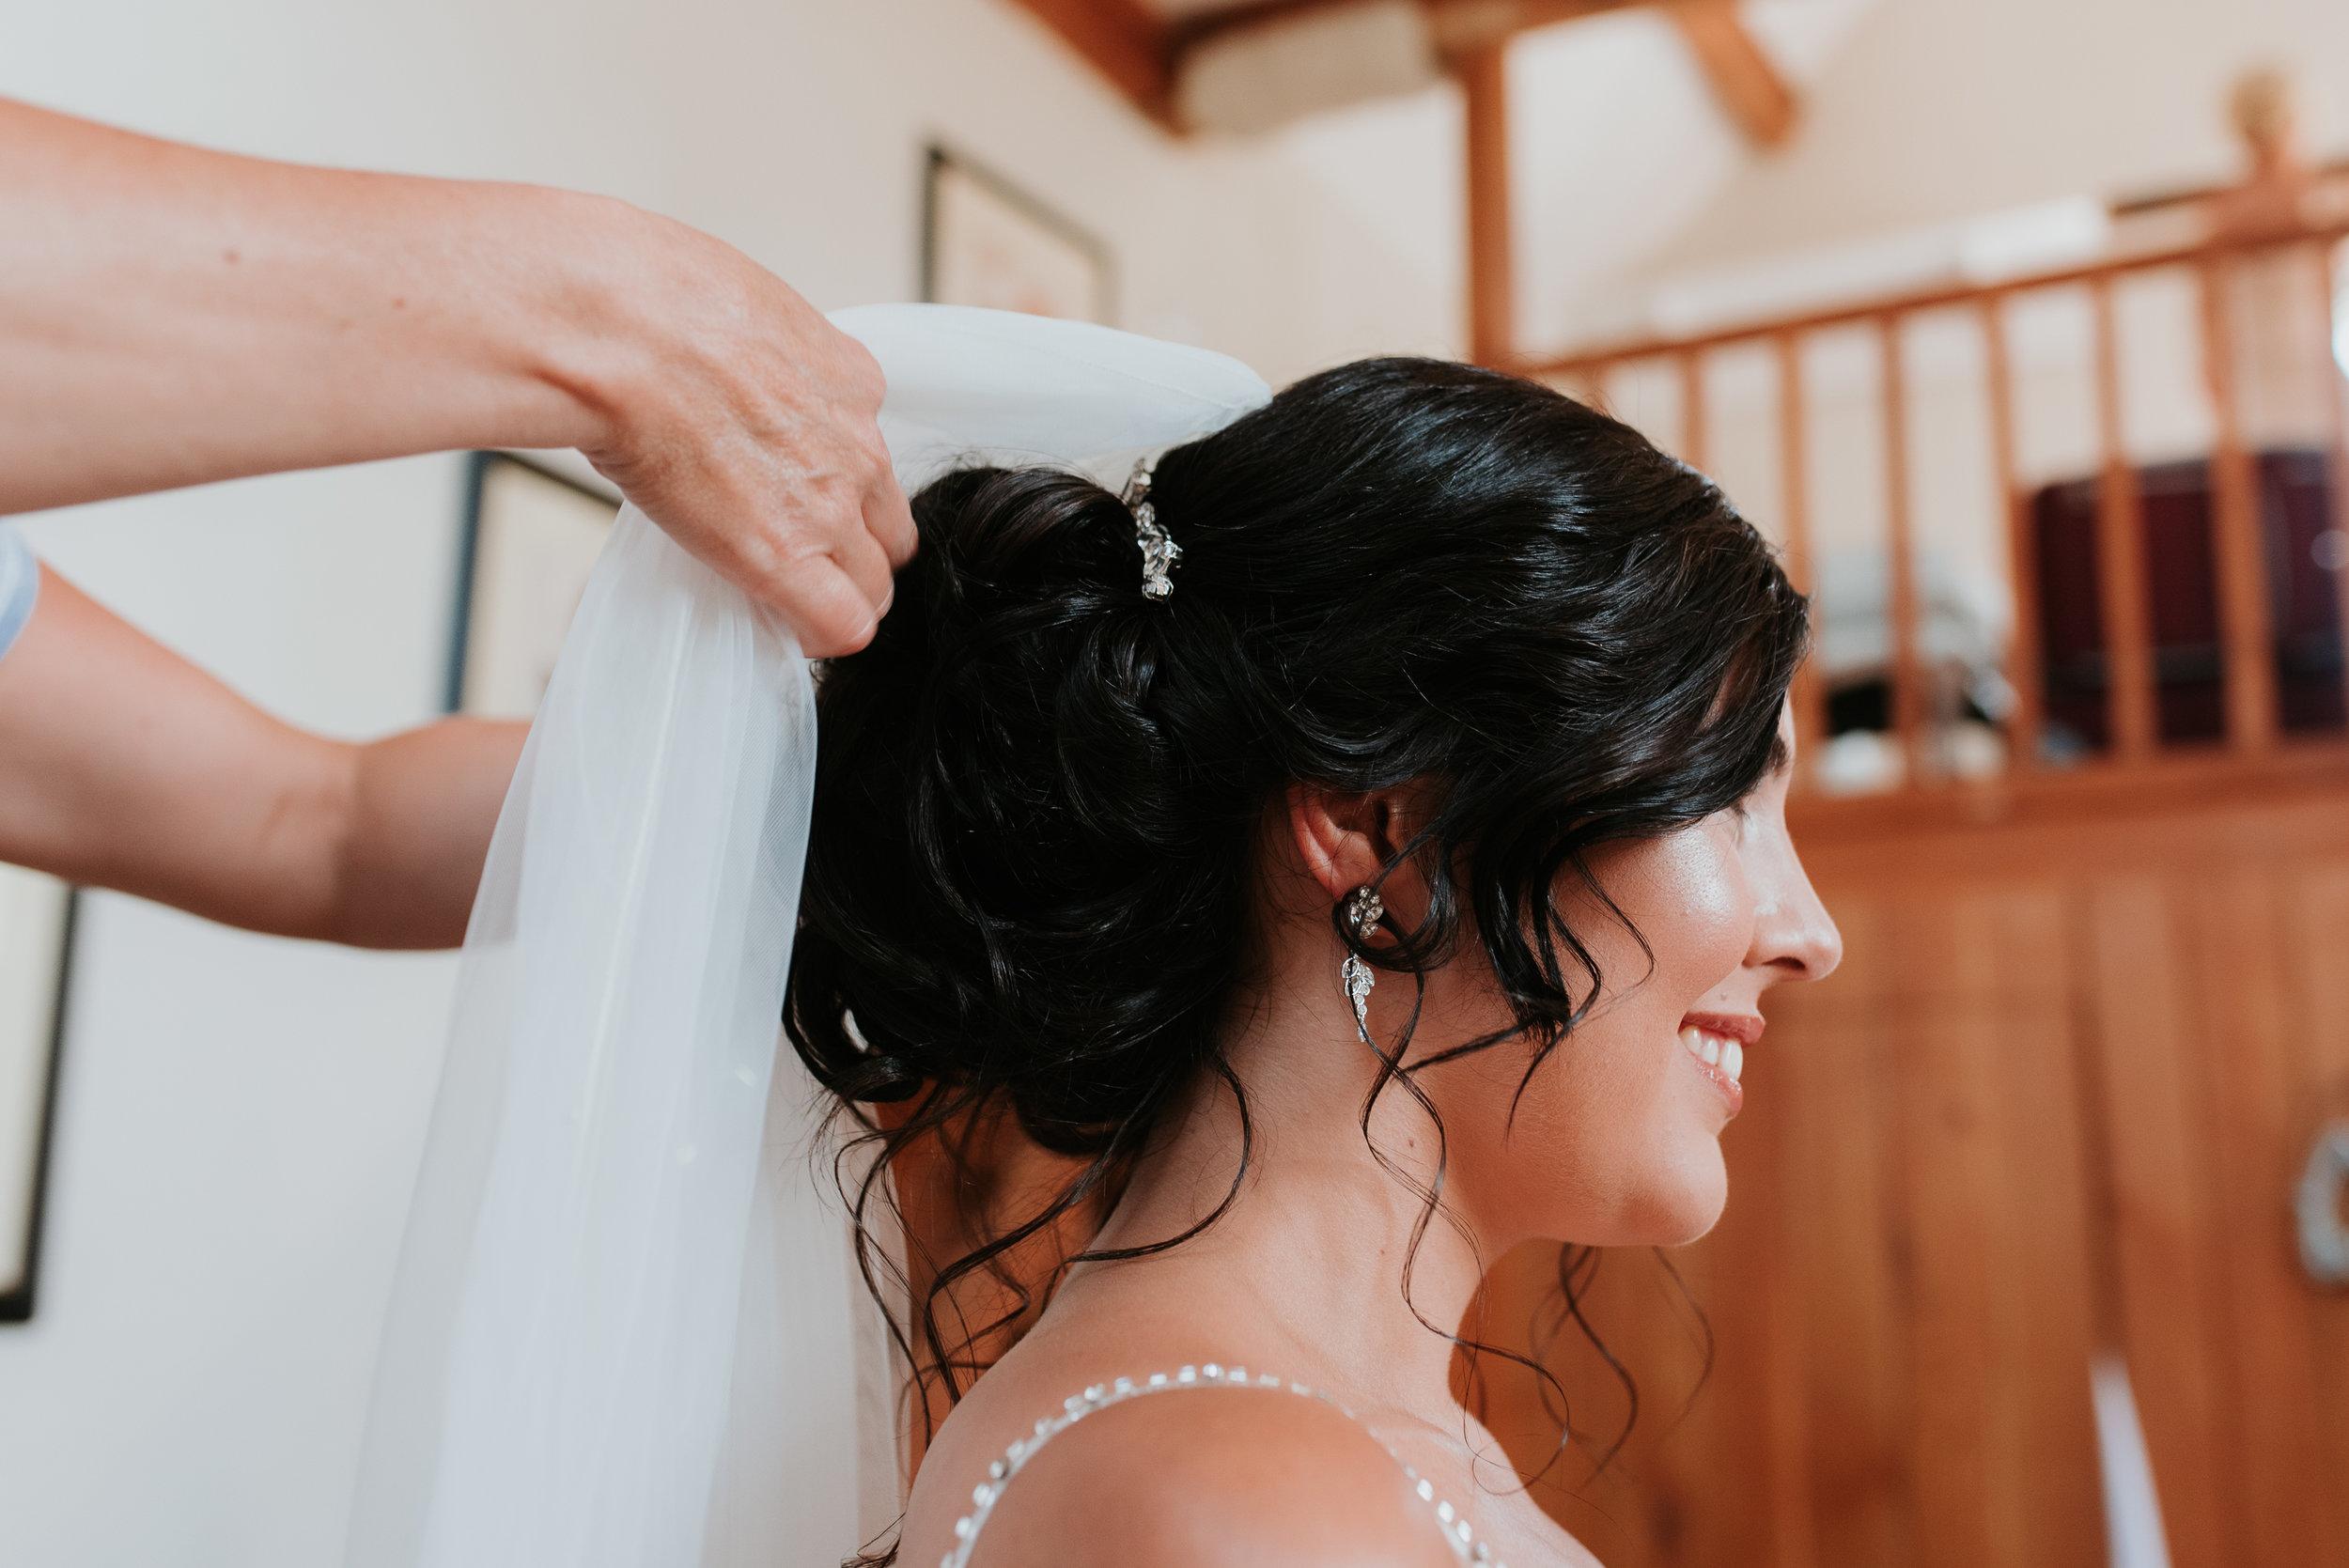 Oxfordshire-wedding-photographer-26.jpg